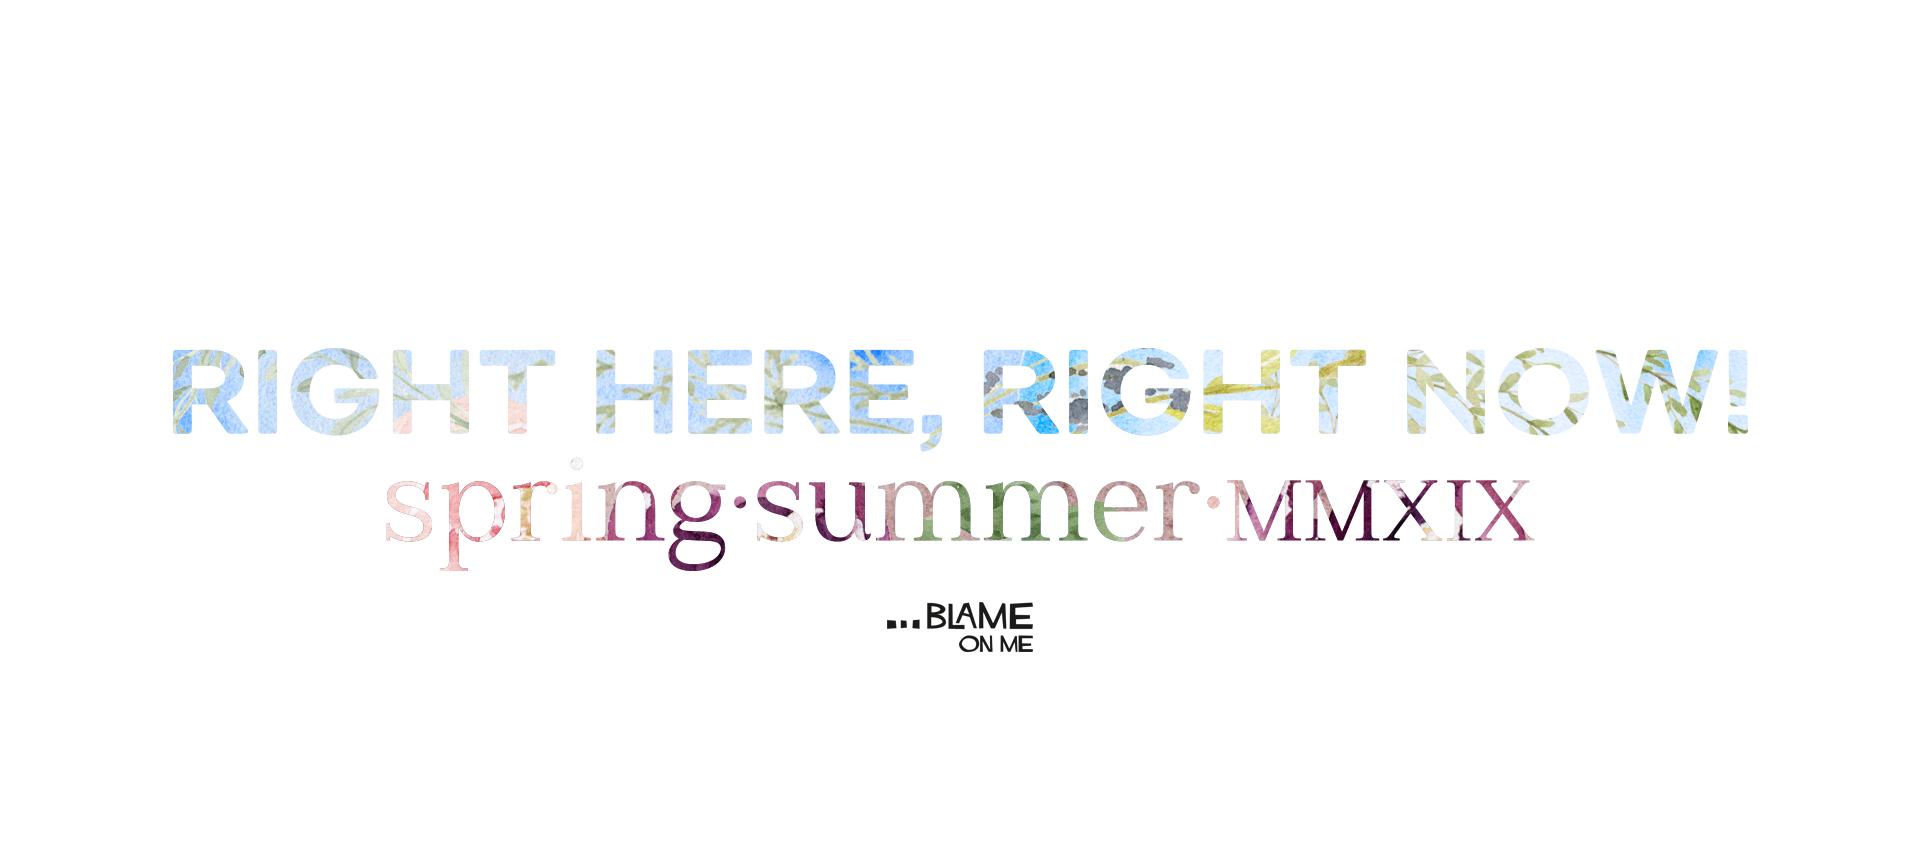 blame-spring-summer-2019-001